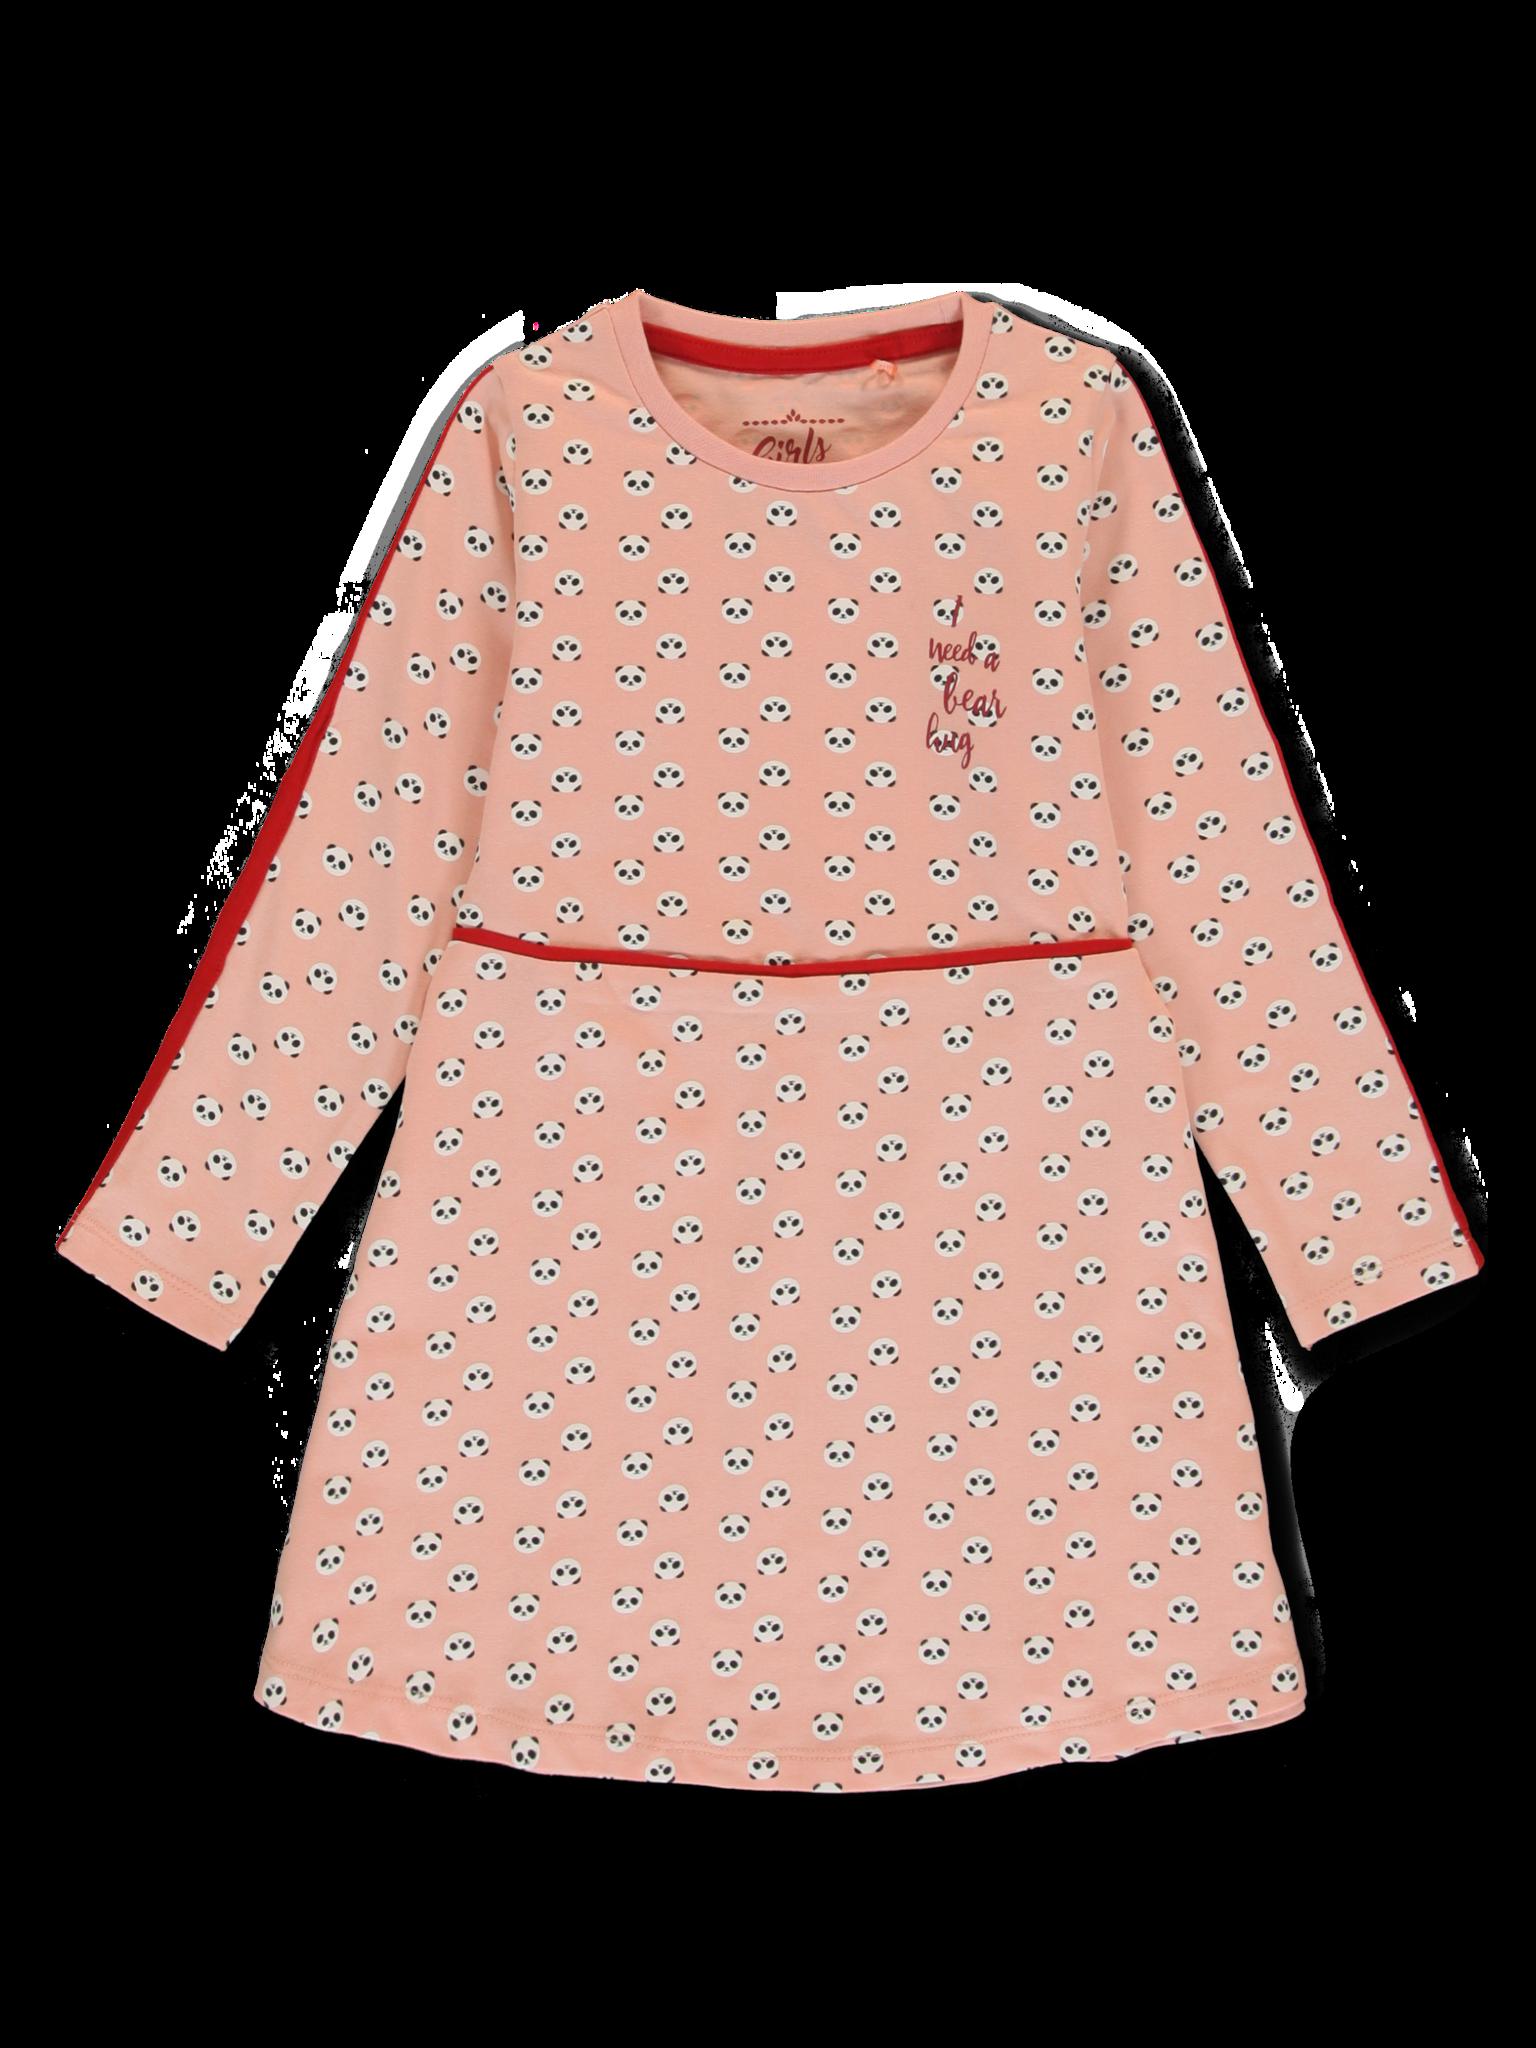 All Brands | Winterproducts Small Girls | Dress | 12 pcs/box